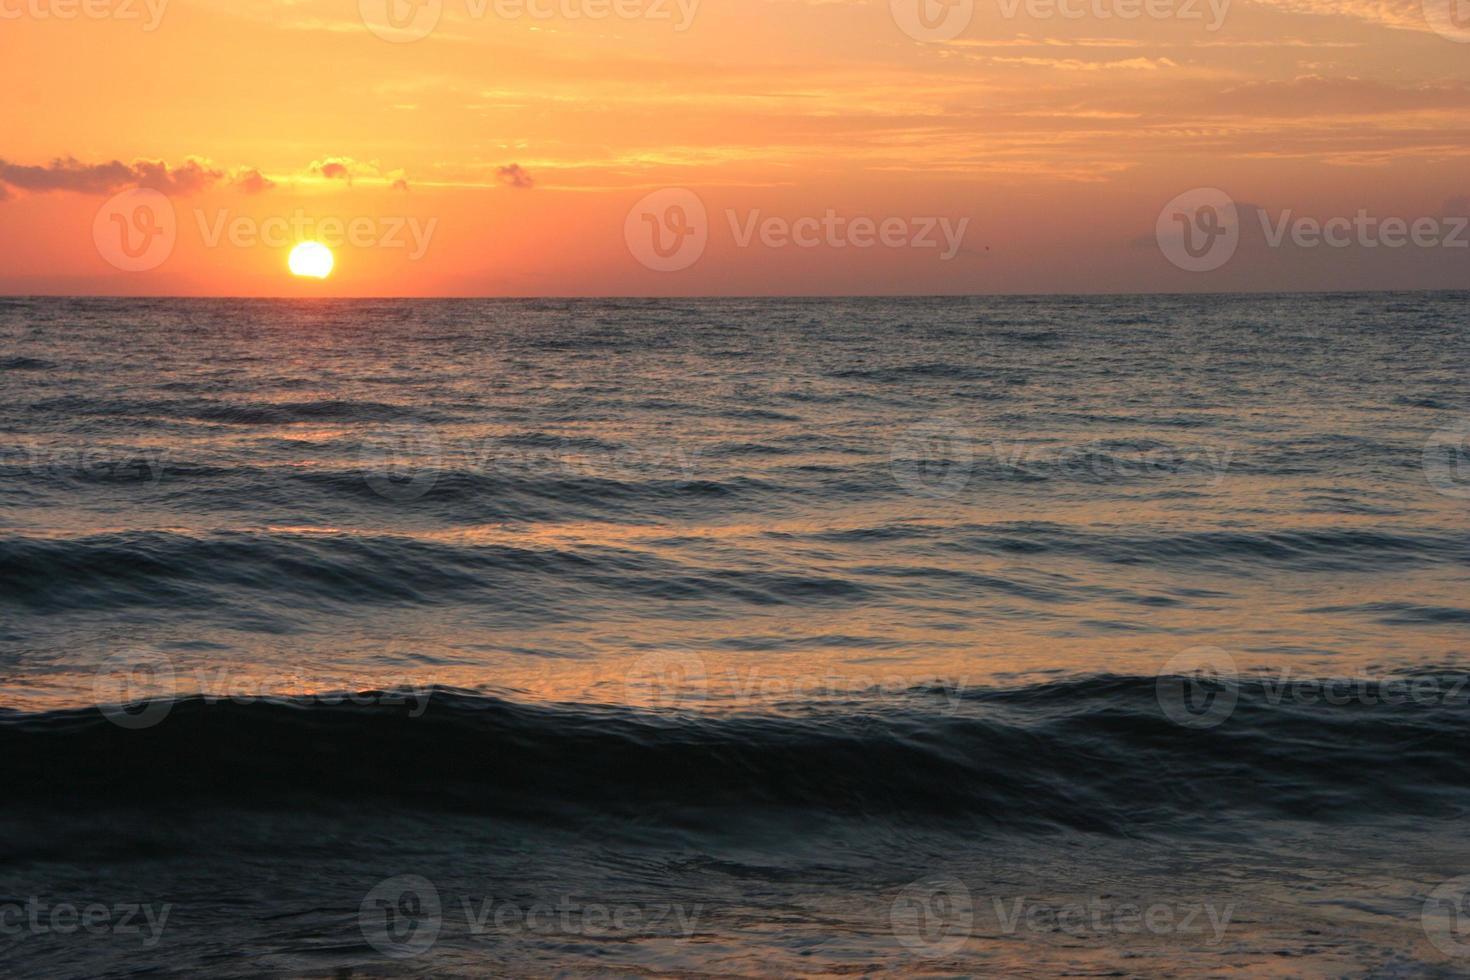 zee zonsondergang / zonsopgang foto